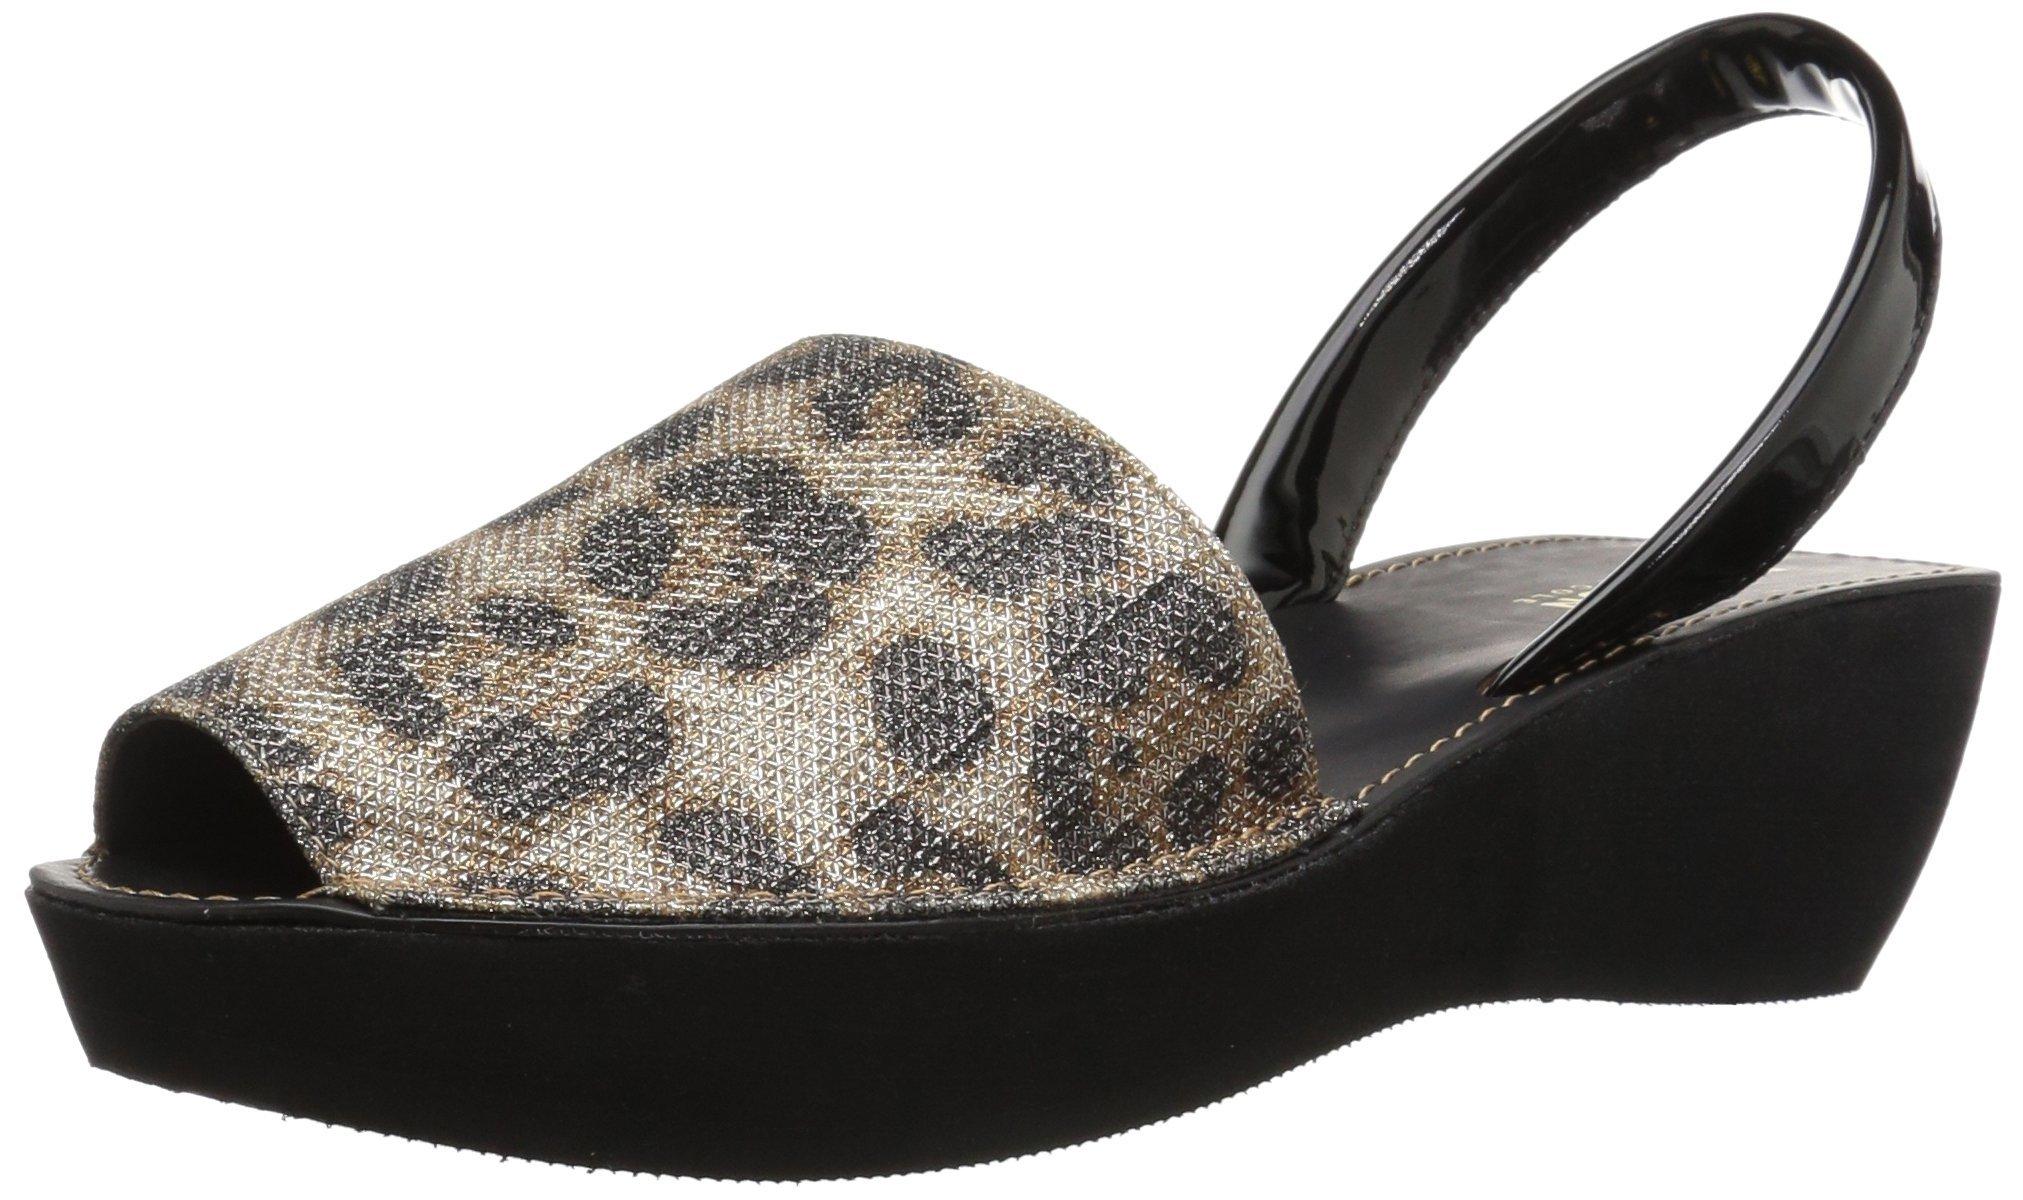 Kenneth Cole REACTION Women's Fine Glass Backstrap Wedge Sandal, Leopard, 9 M US